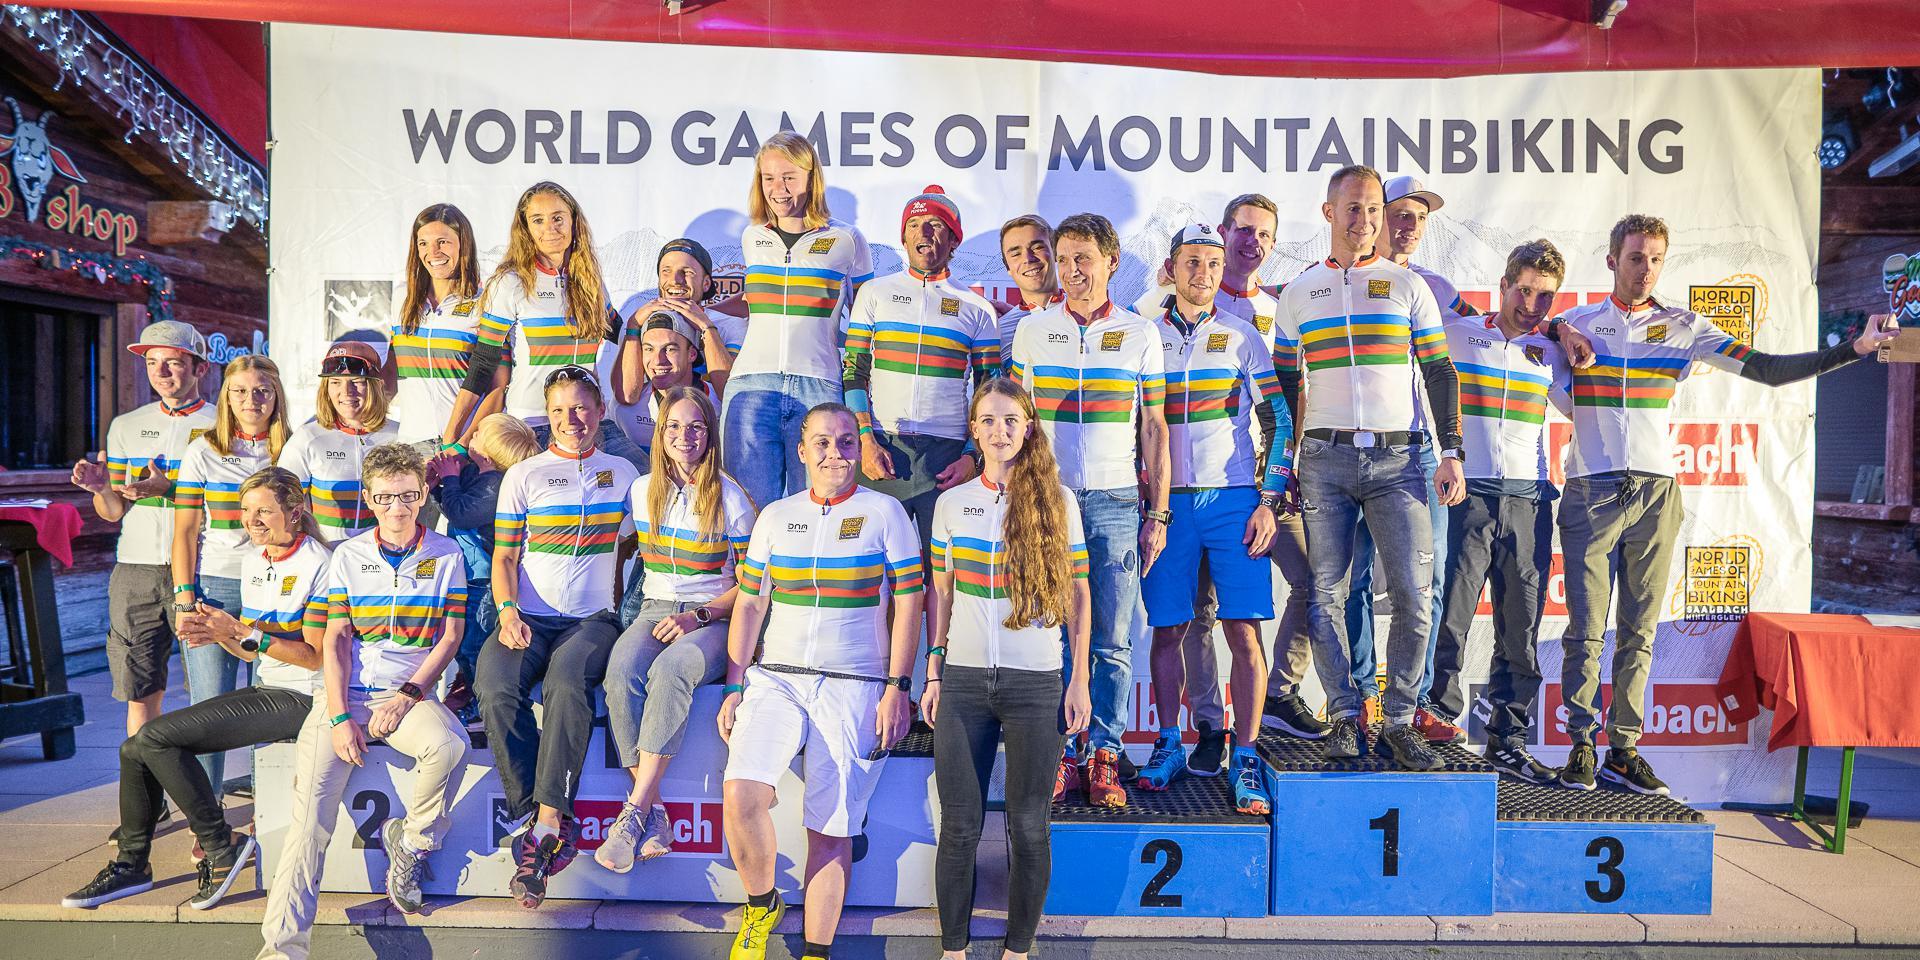 22. World Games of Mountainbiking